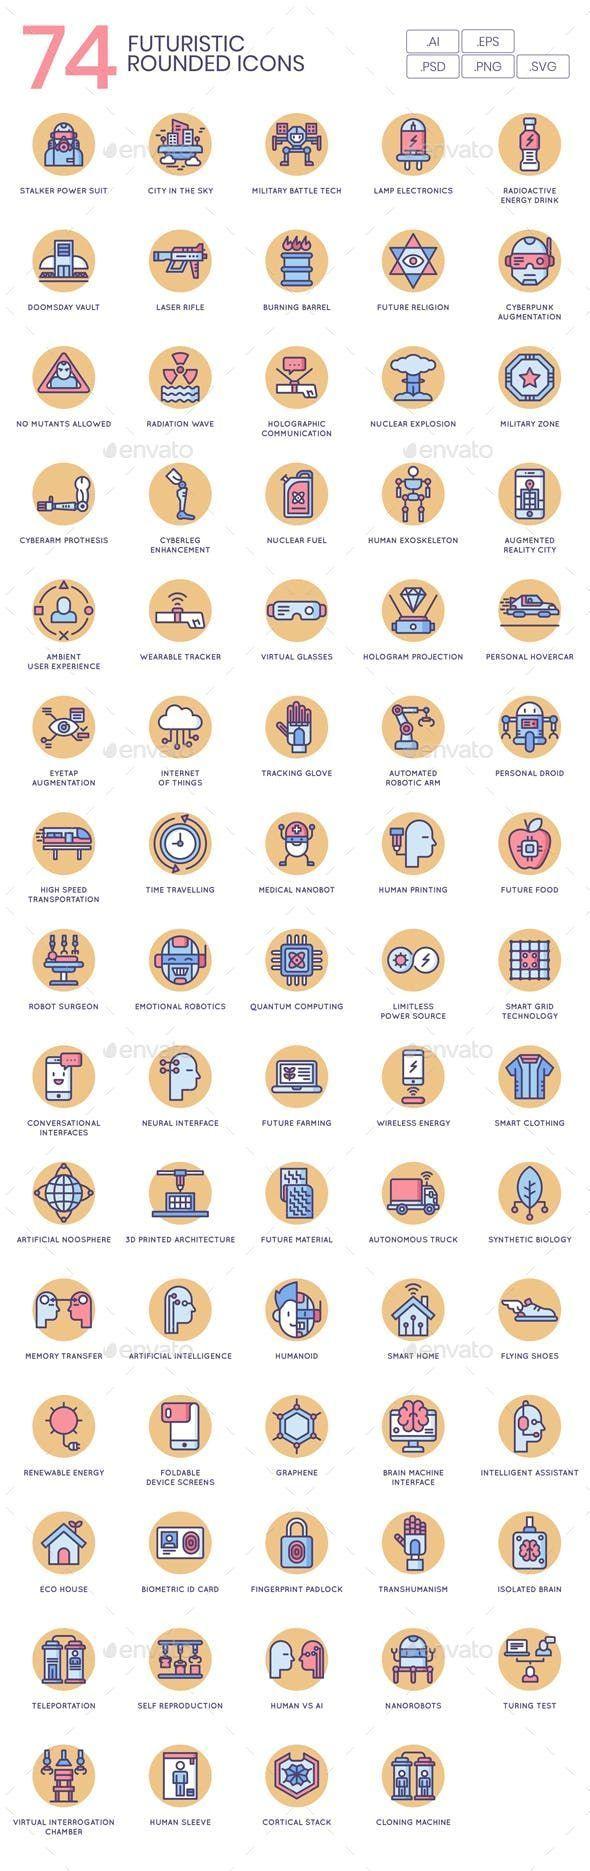 25 + › #Zukunft #Technologie #Icons – Butterscotch – Technologie-Icons